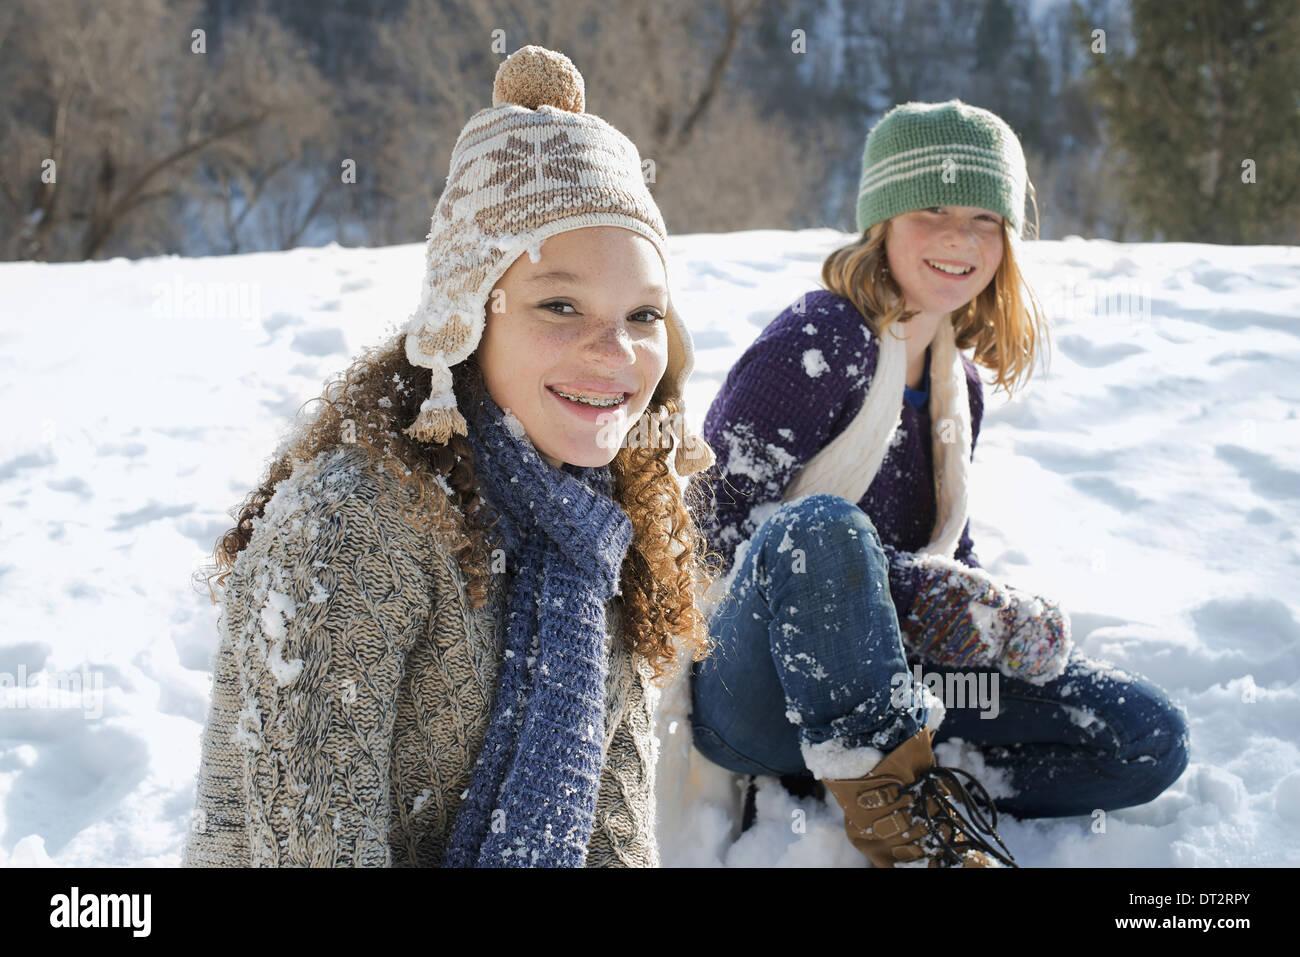 snow stockfotos snow bilder alamy. Black Bedroom Furniture Sets. Home Design Ideas